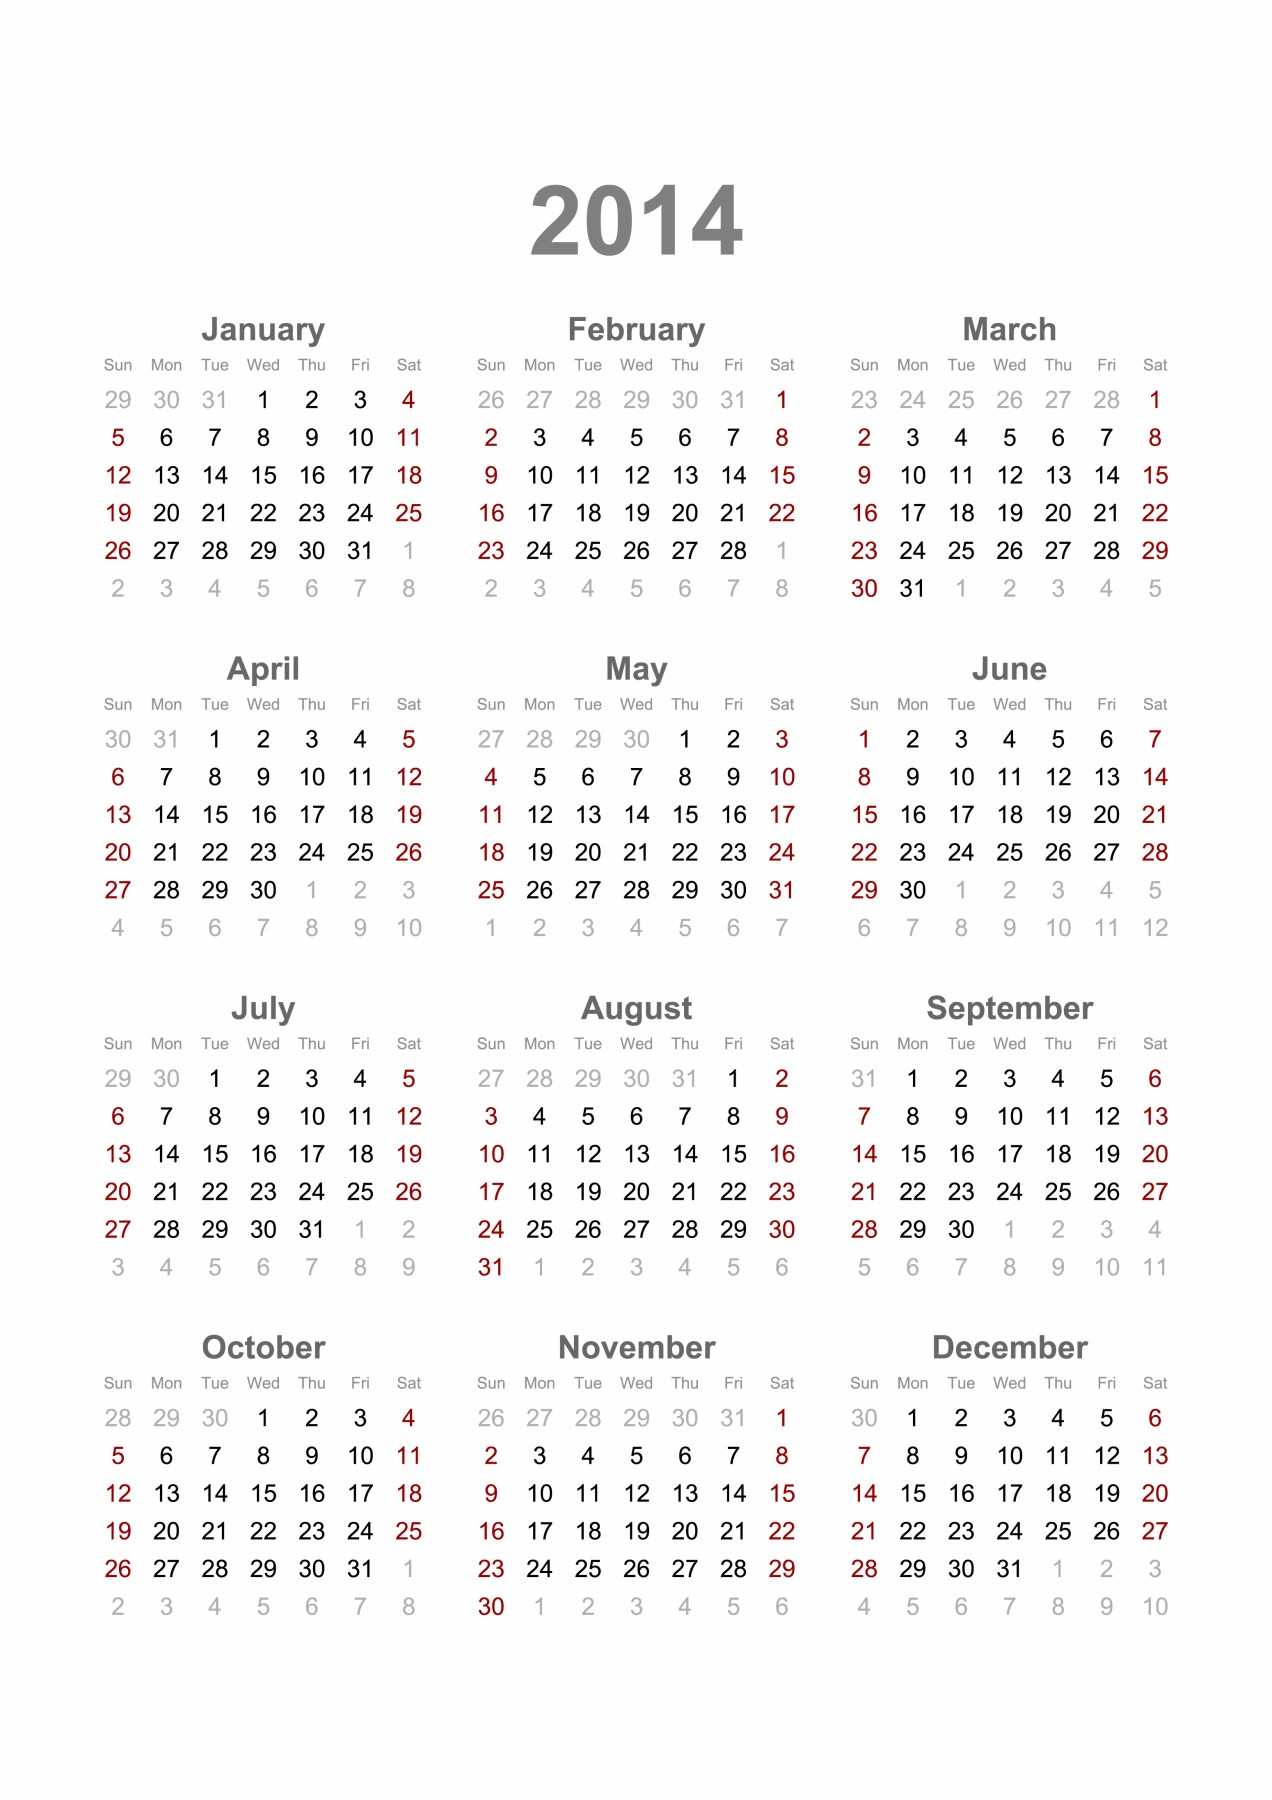 ... 2014 calendar printable 2014 calendar ready to printable new year 2014